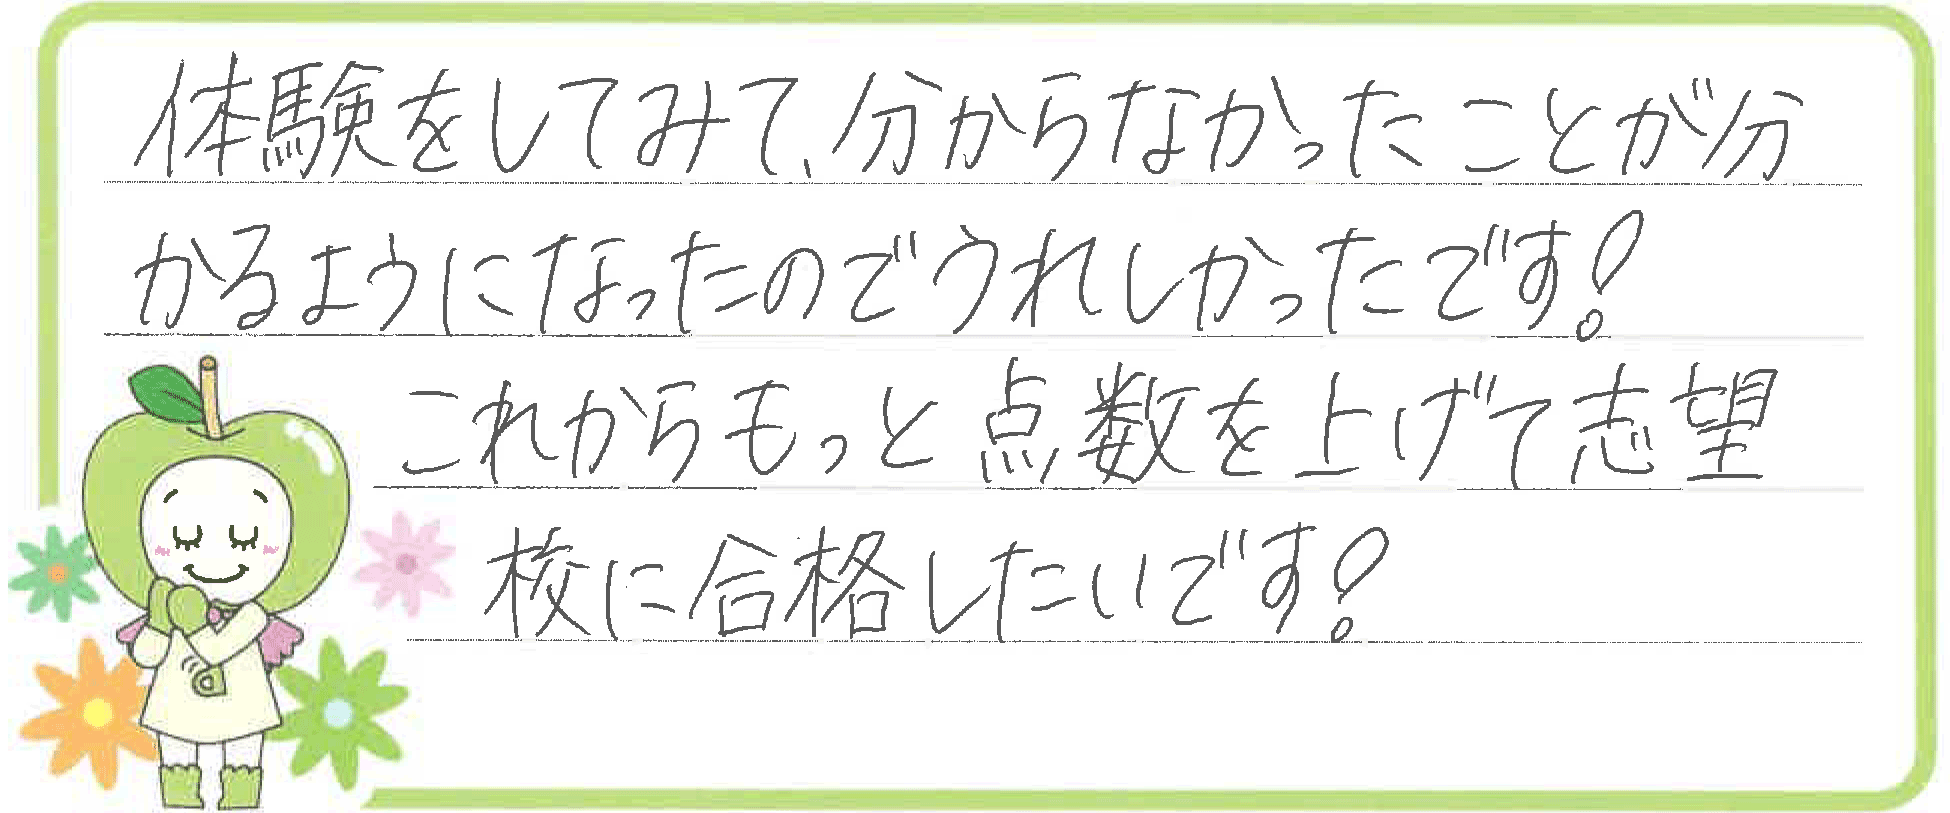 N.Sちゃん(河北郡内灘町)からの口コミ